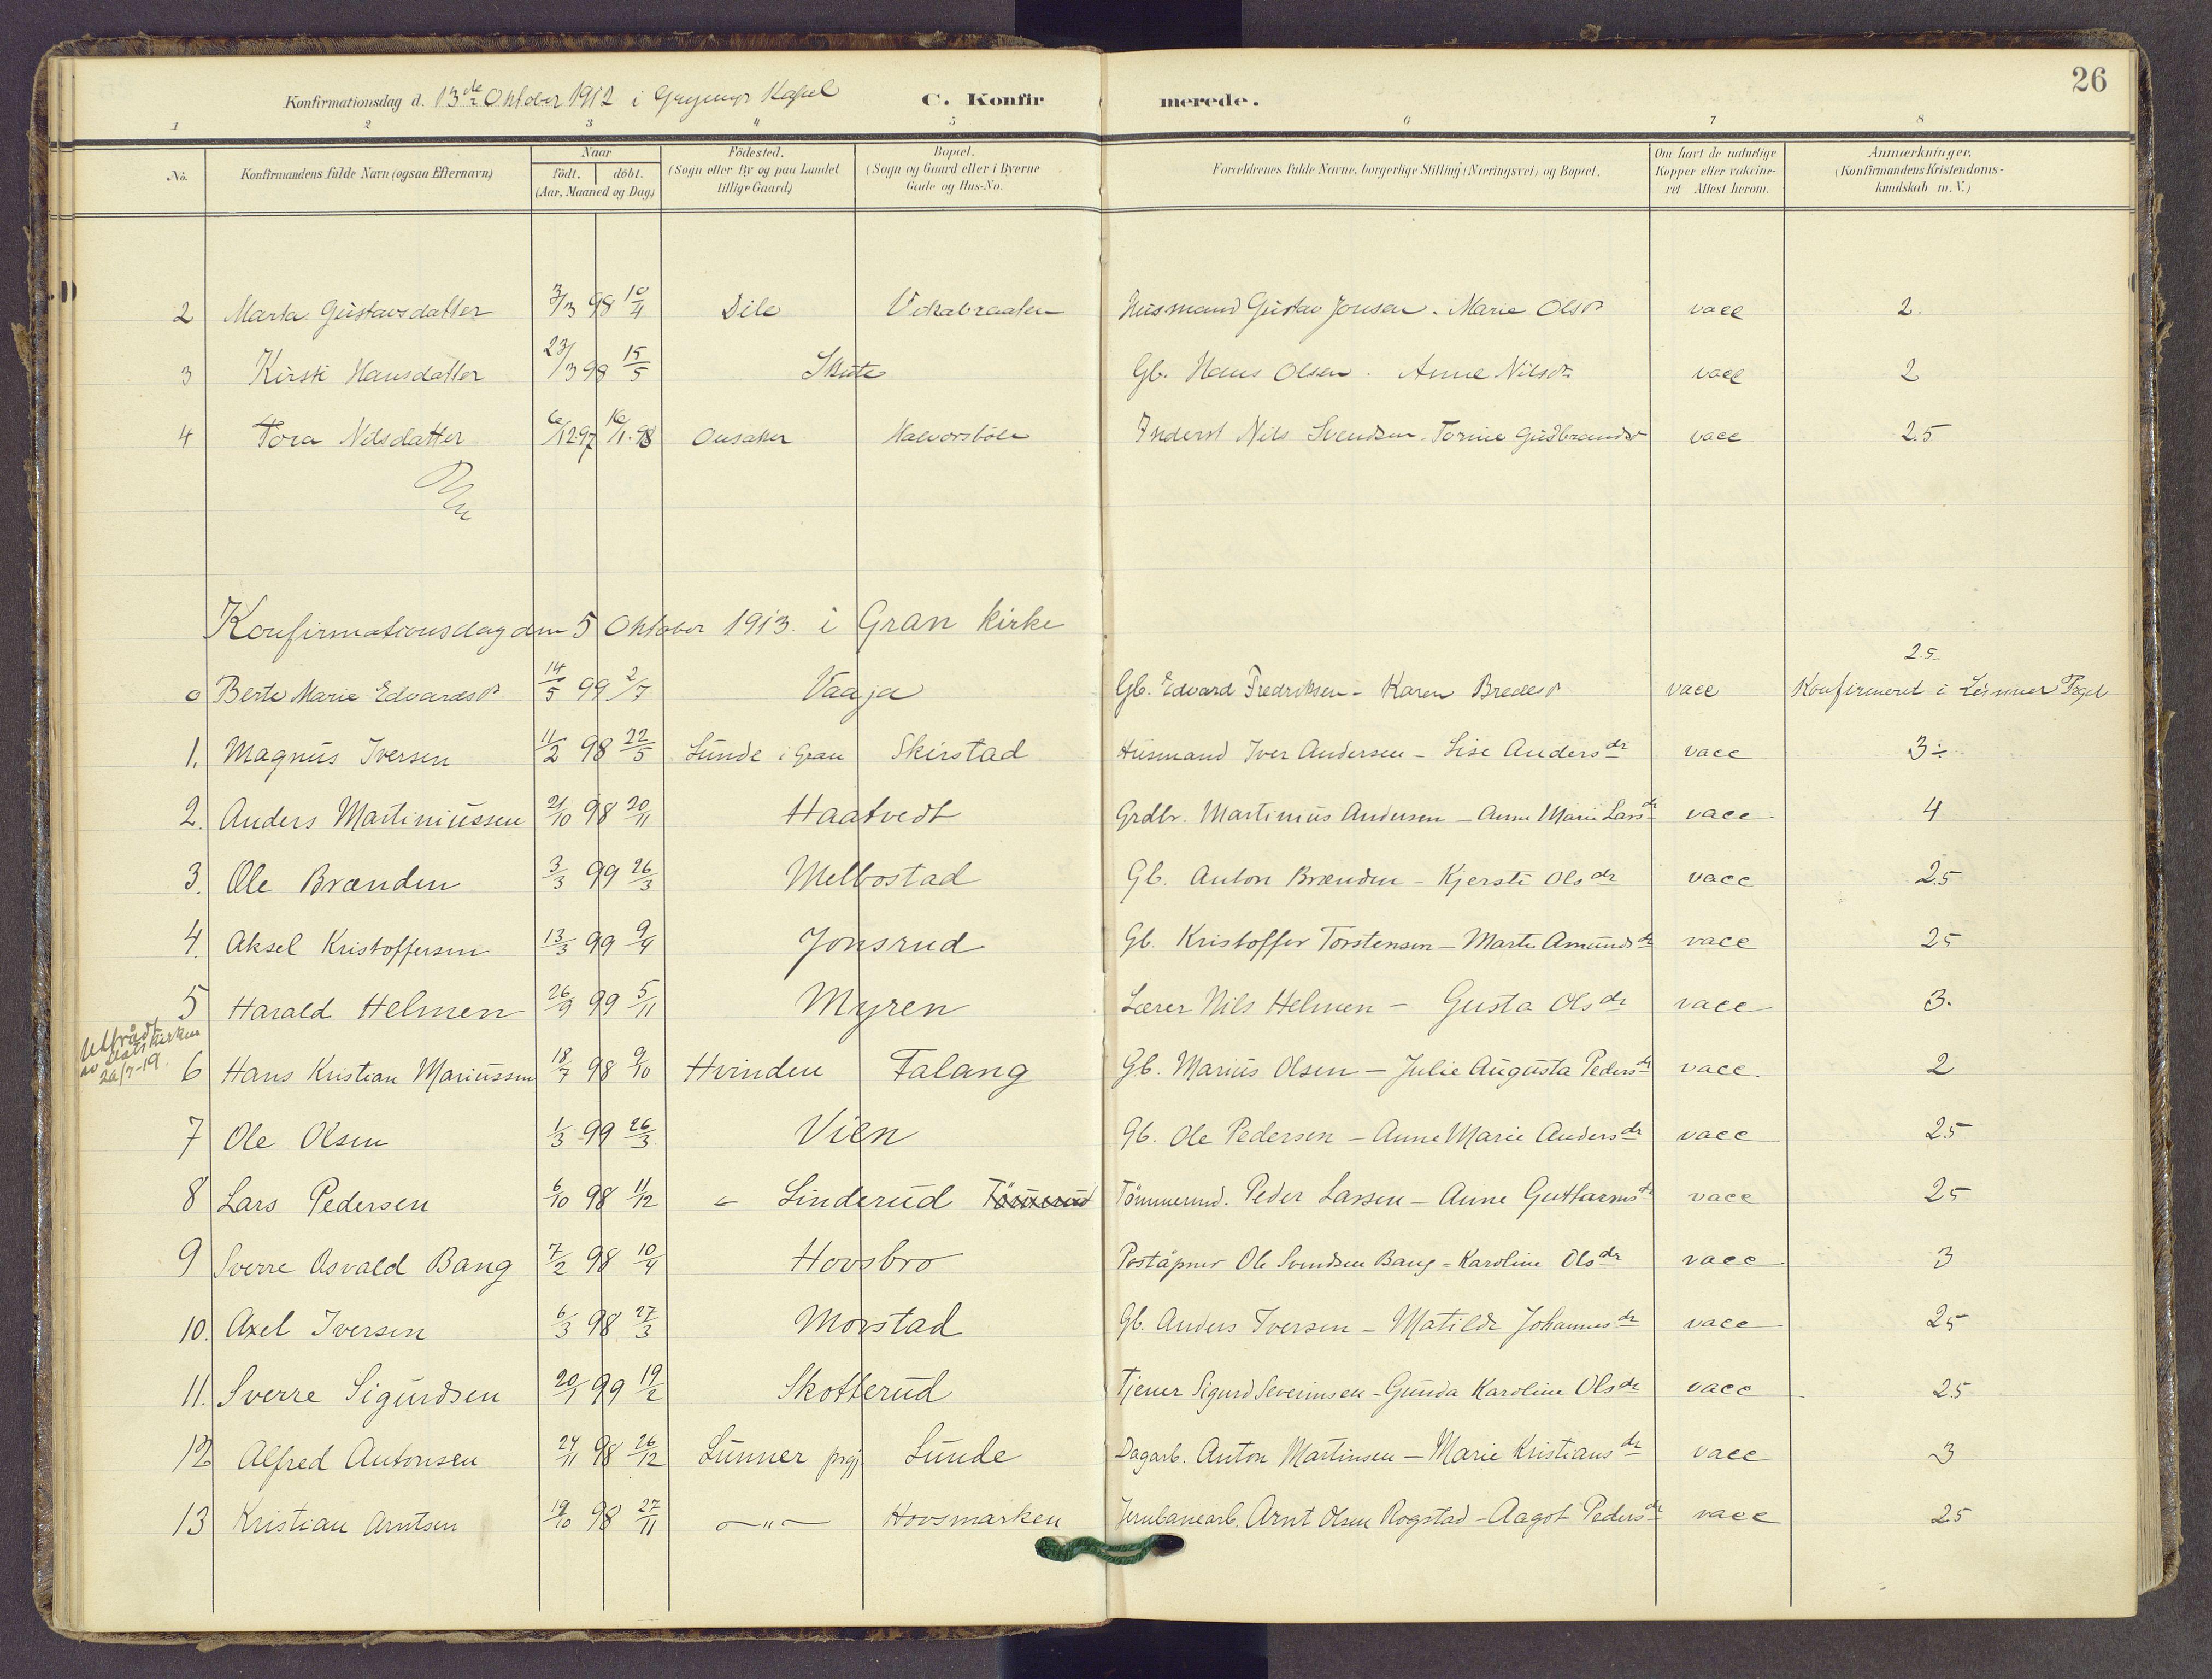 SAH, Gran prestekontor, Ministerialbok nr. 22, 1908-1918, s. 26